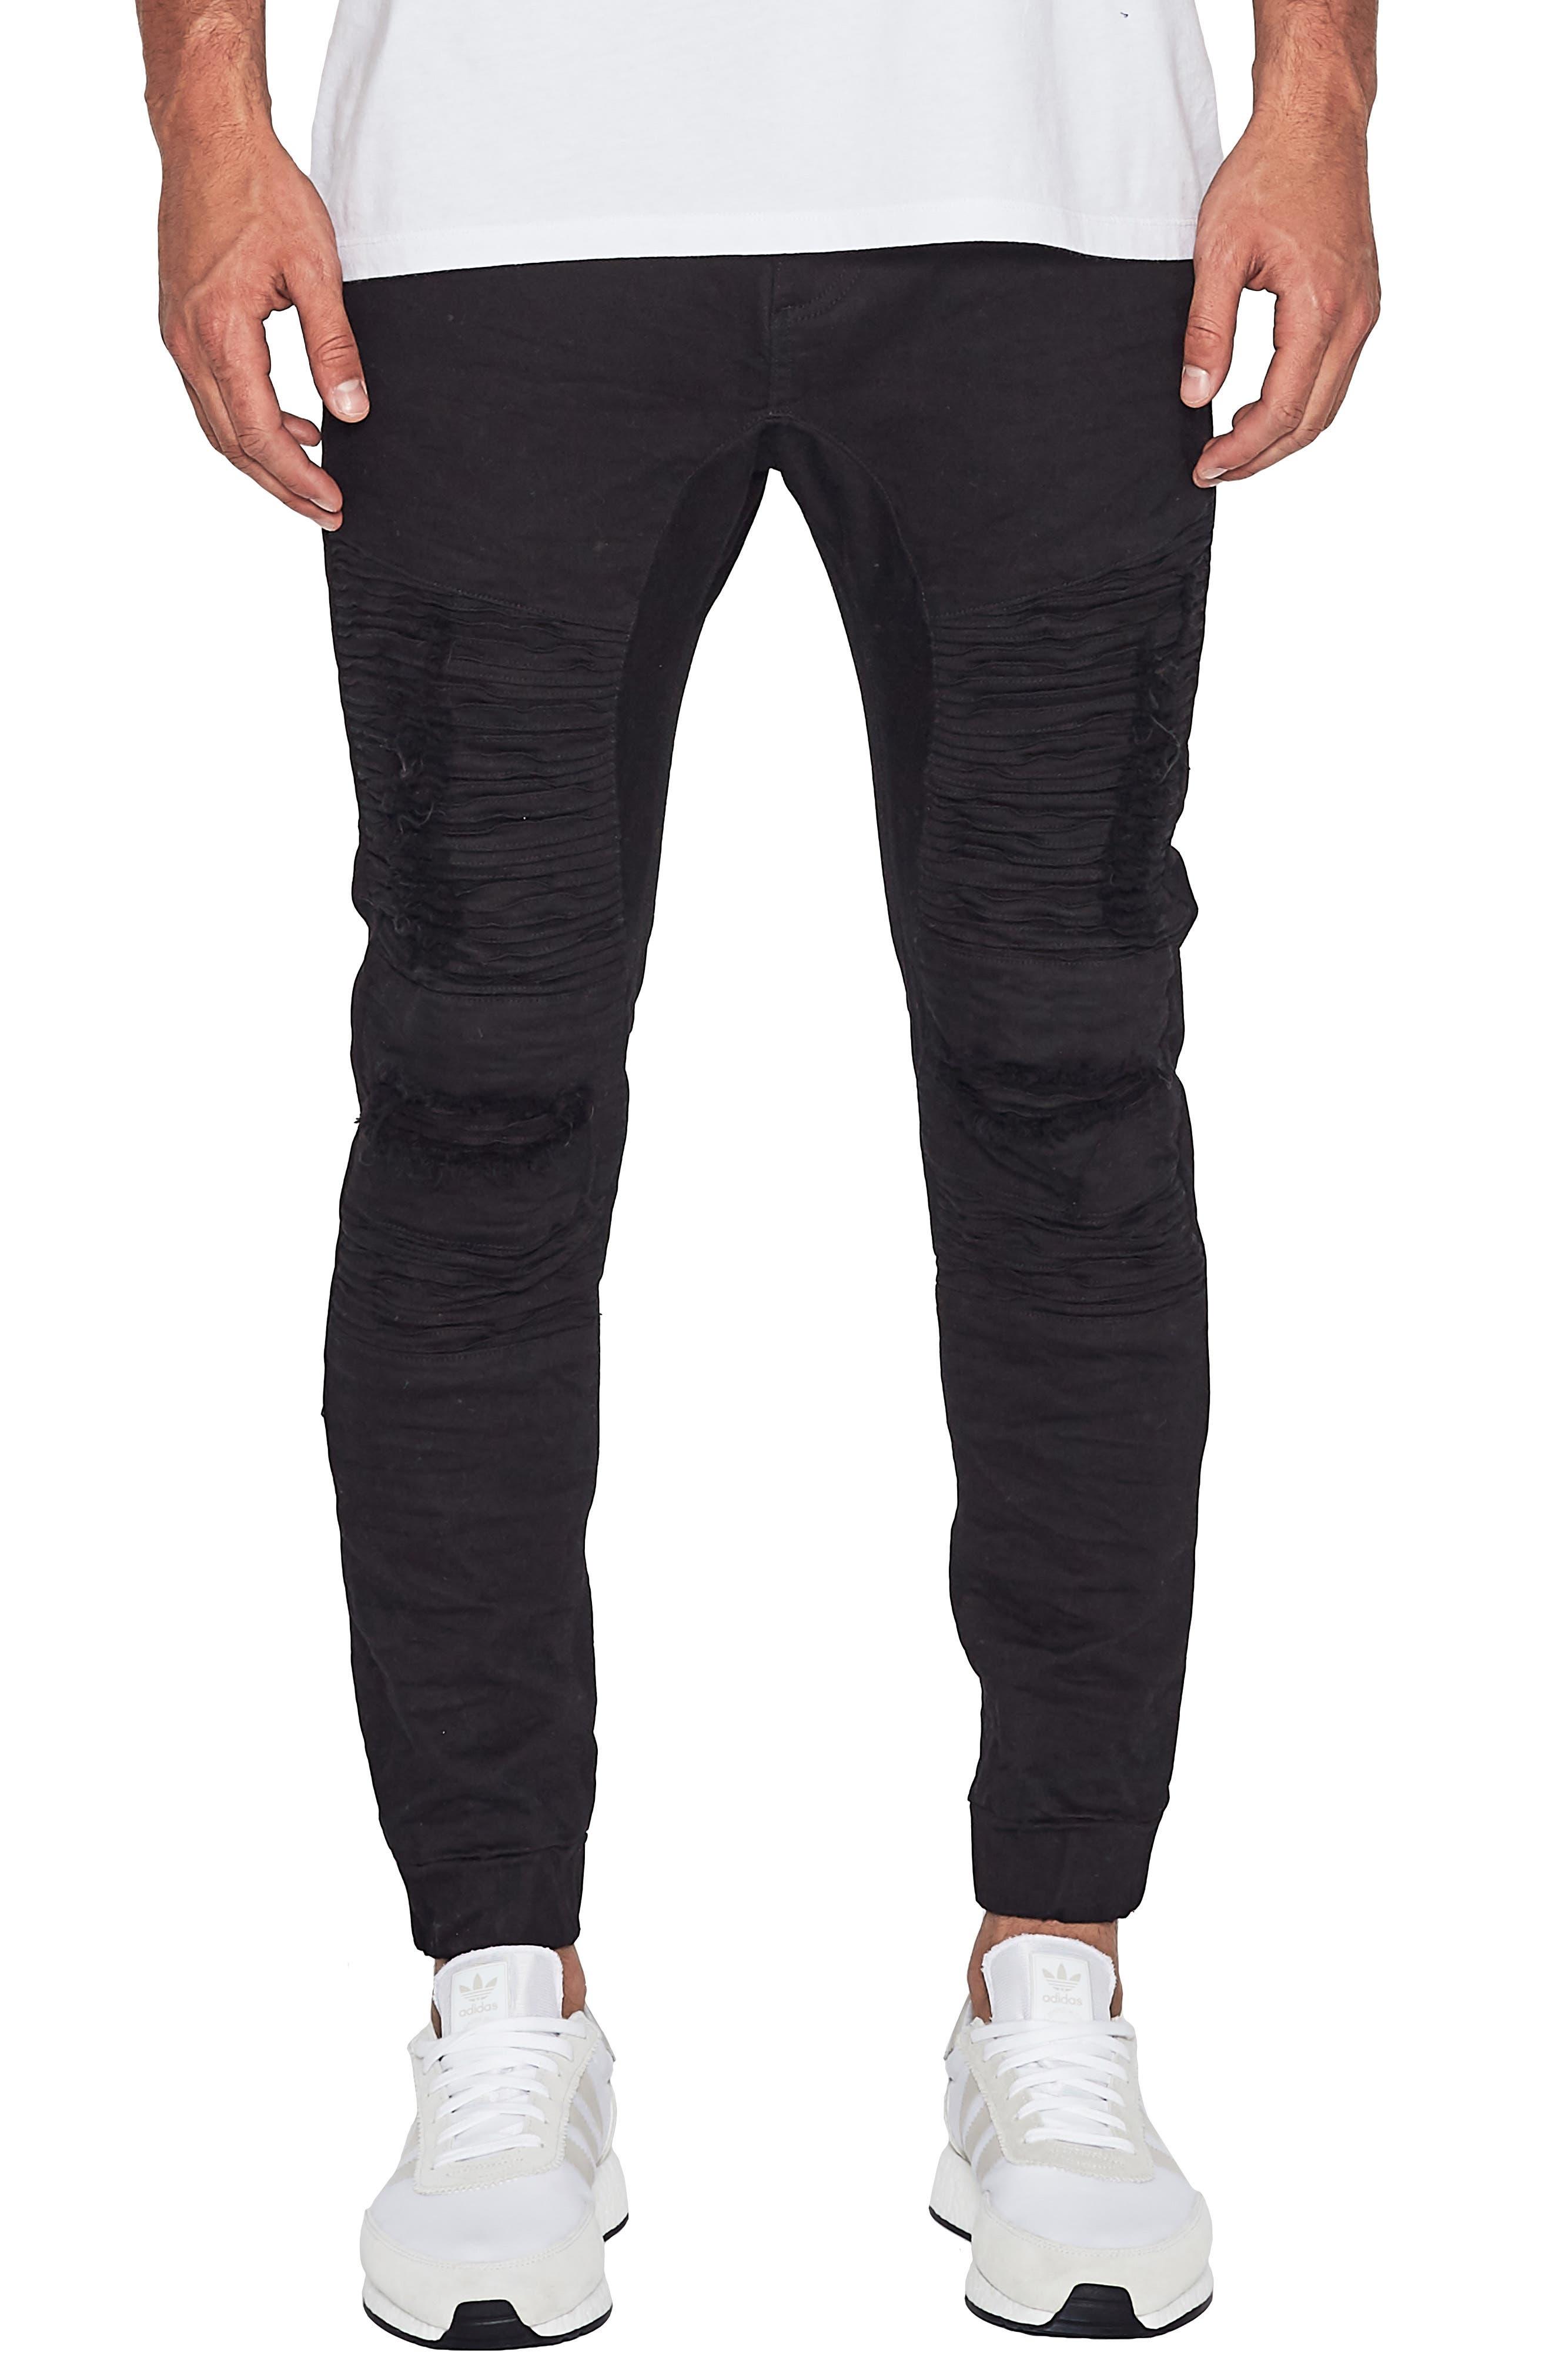 Hellcat Slim Fit Pants,                         Main,                         color, Jet Black